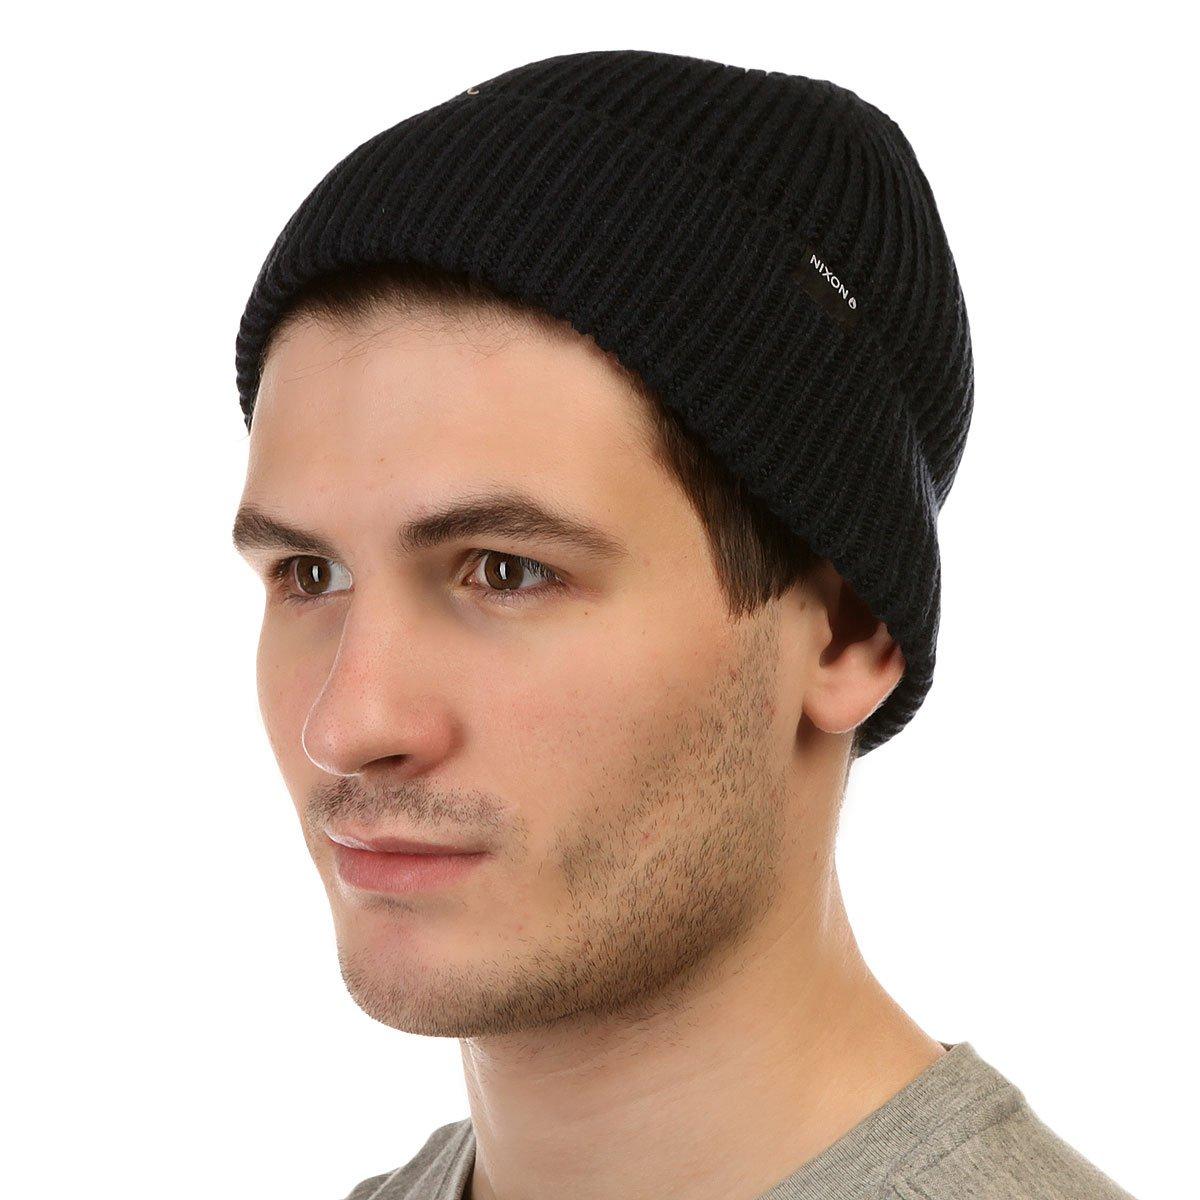 aa70b6240dc2e Купить шапку Nixon Regain Beanie Navy в интернет-магазине Proskater.kz